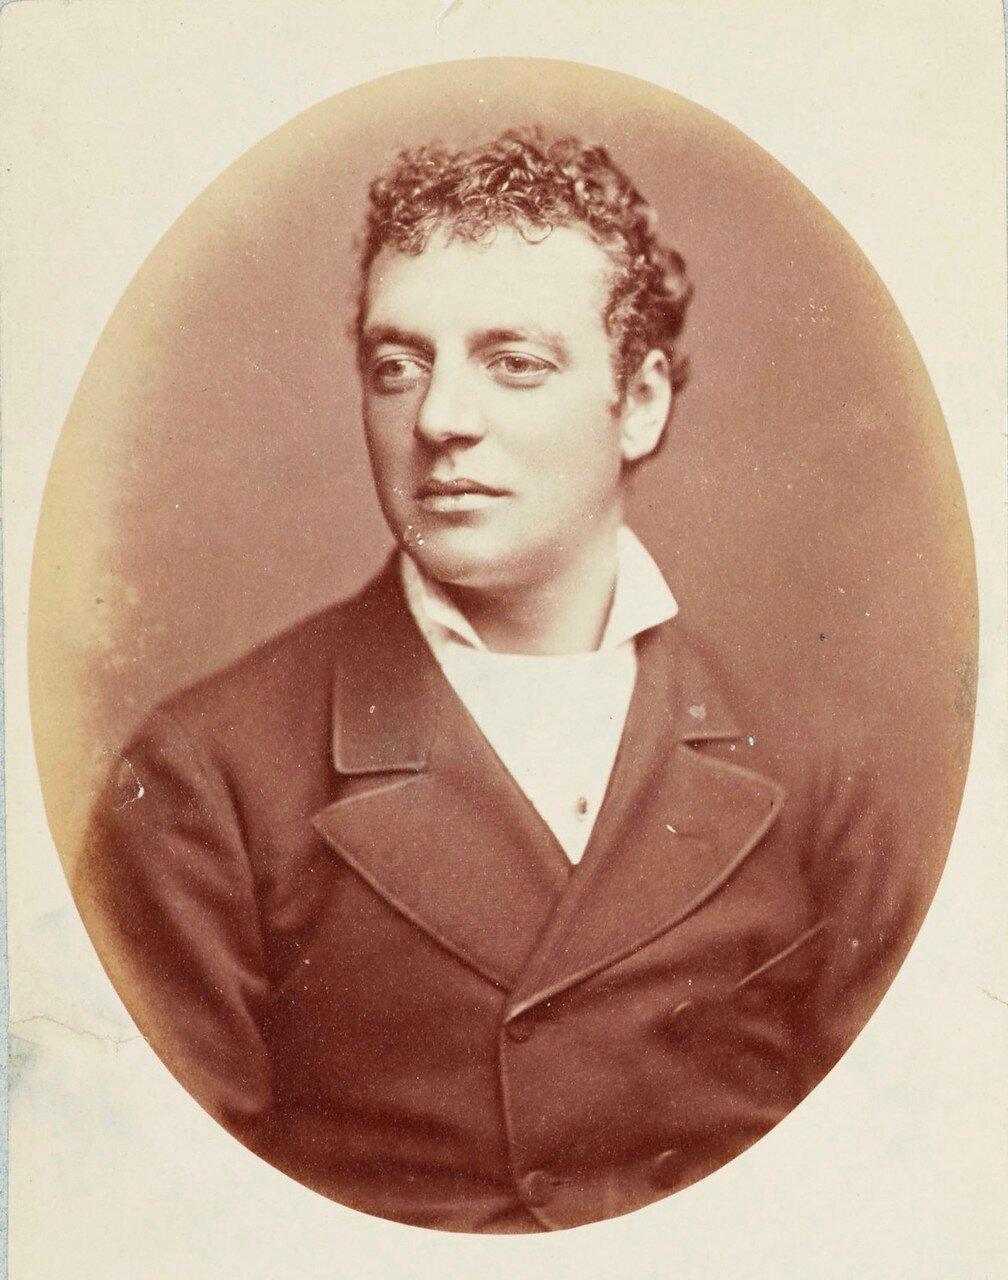 149. Лорд Чарльз Уильям де ла Повер Бересфорд, 1-й барон Бересфорд (1846-1919)